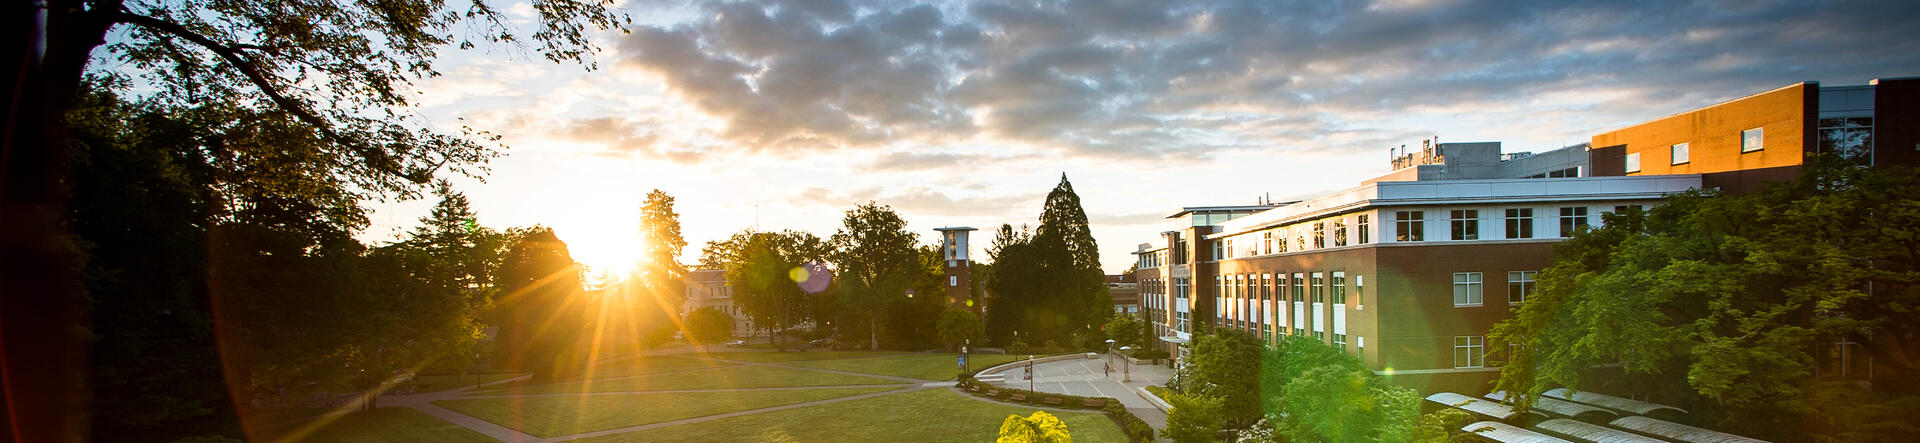 sunrise-over-library-quad